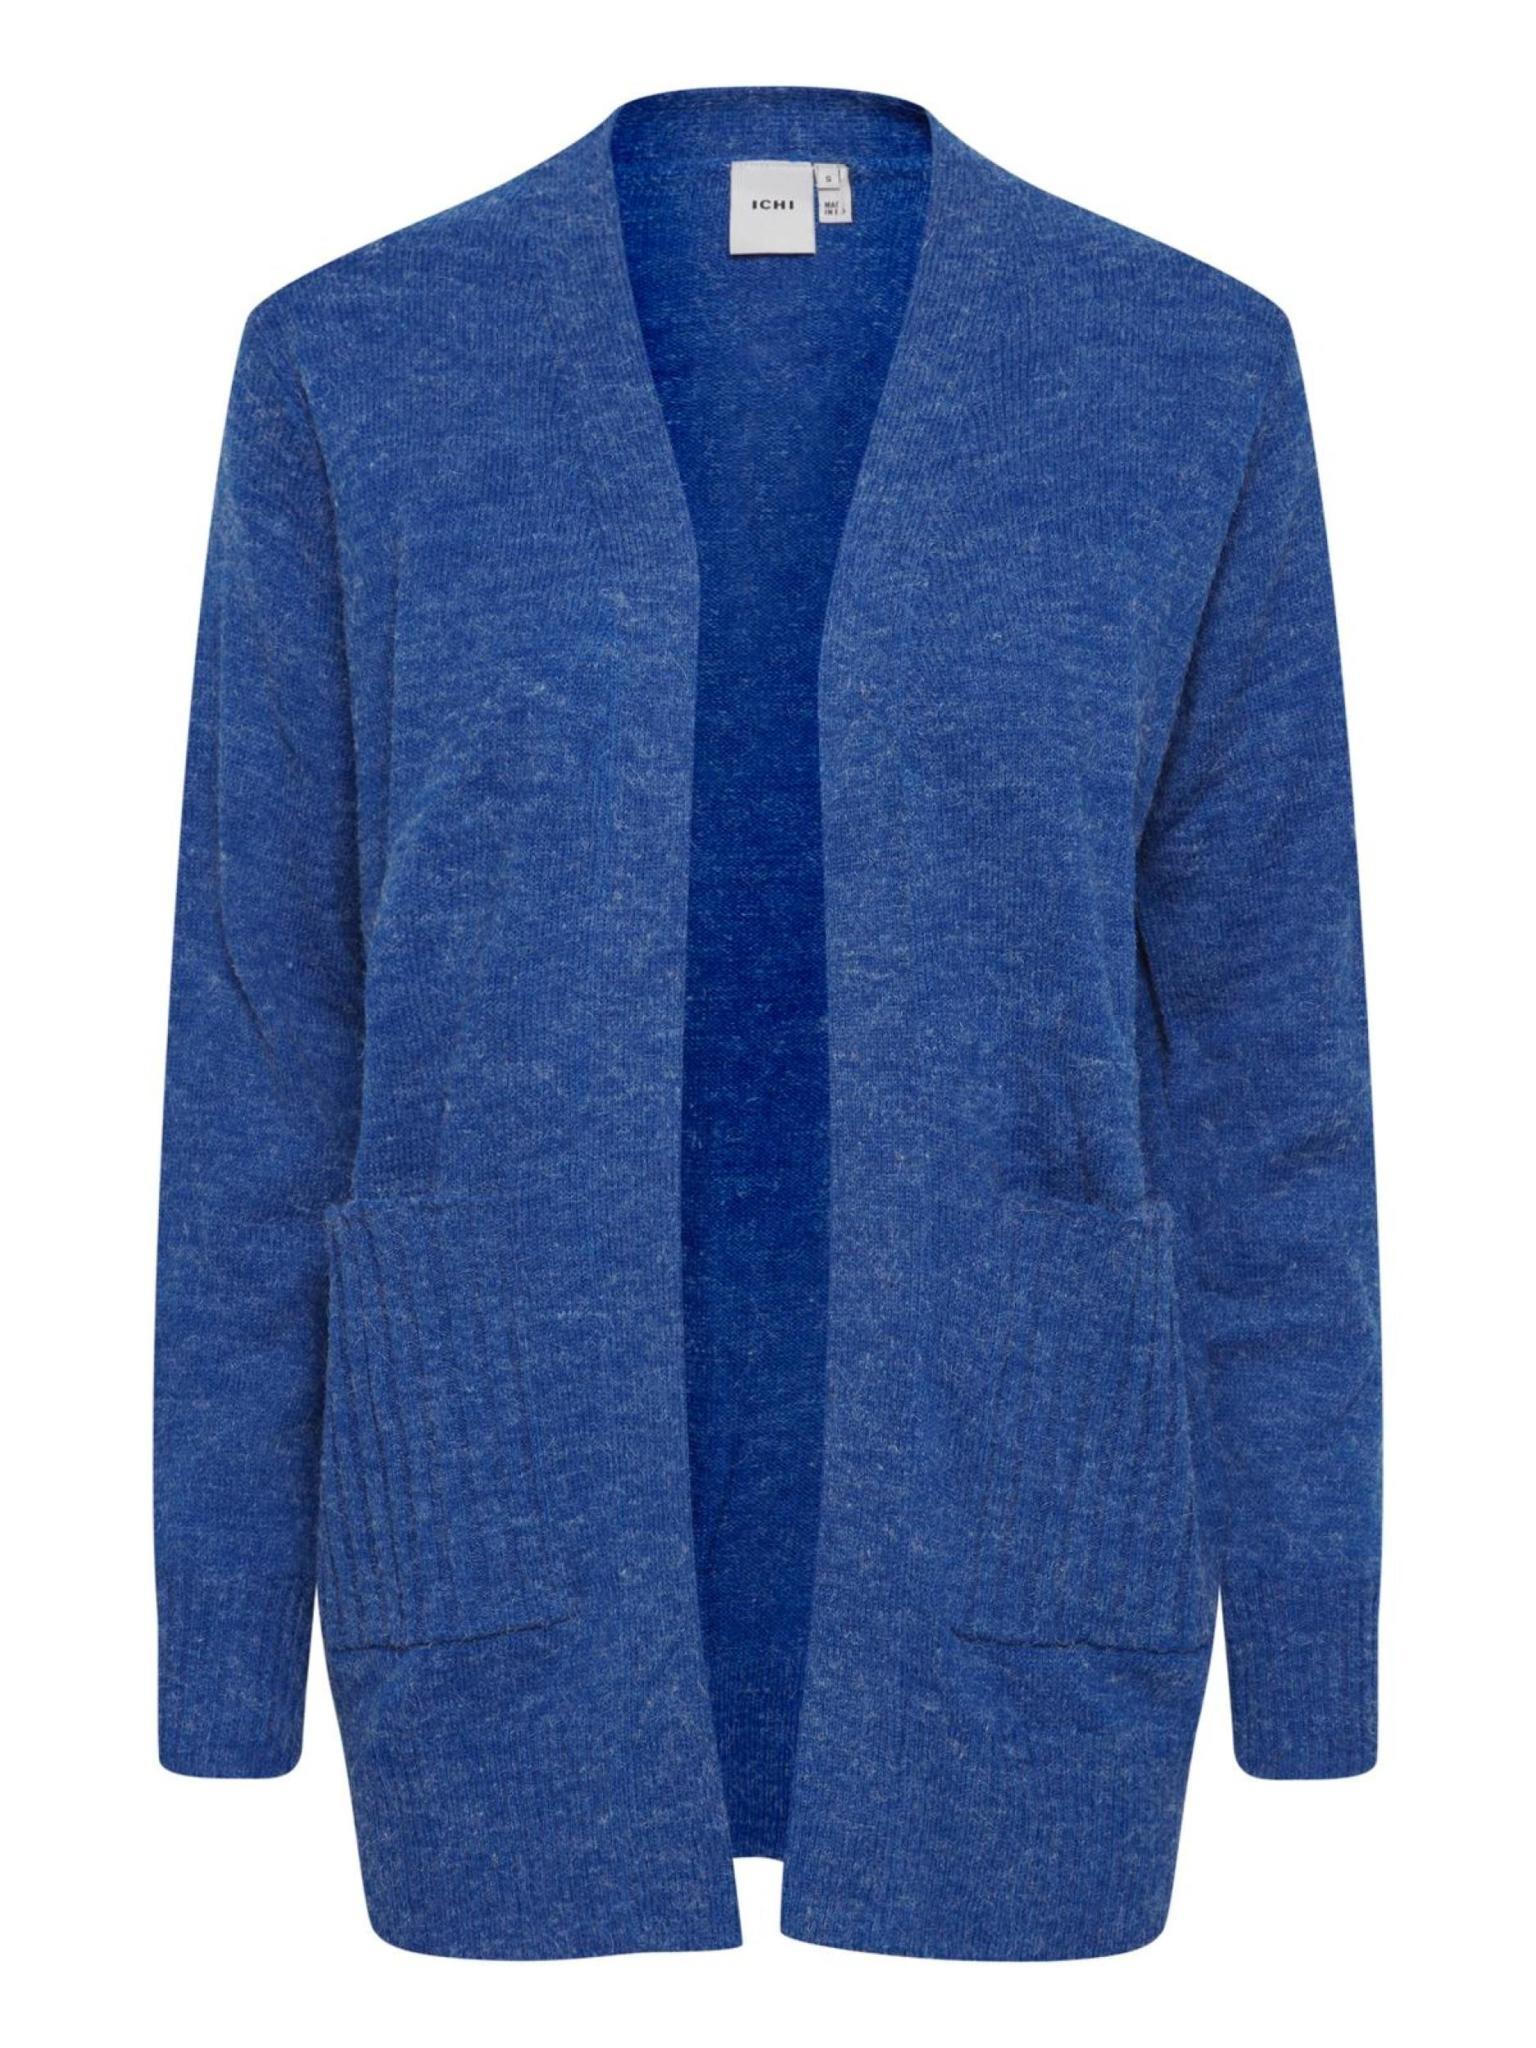 ICHI Marat Knitted Cardigan